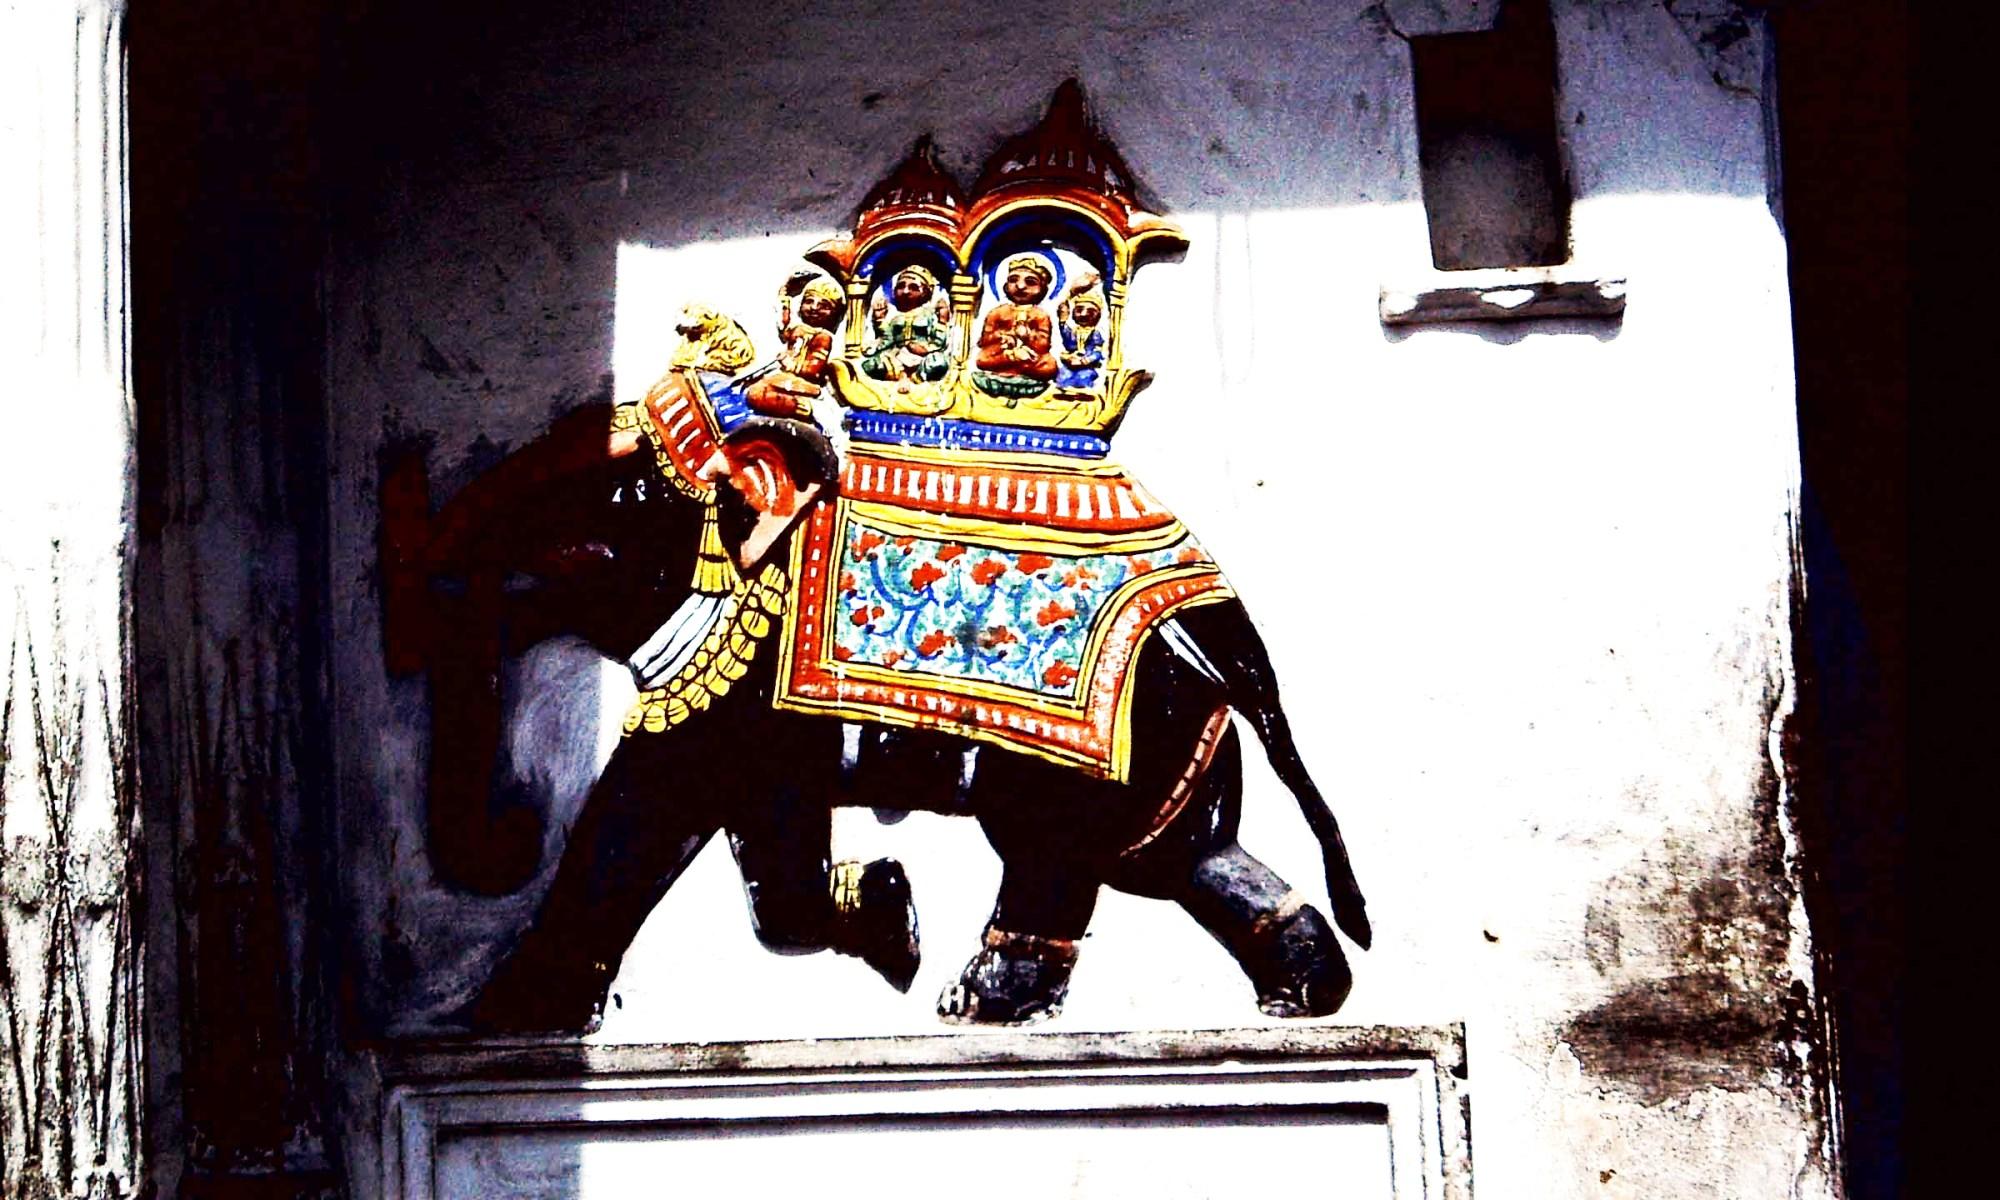 Elefant Udaipur (c)1983 Corinne I.Heitz